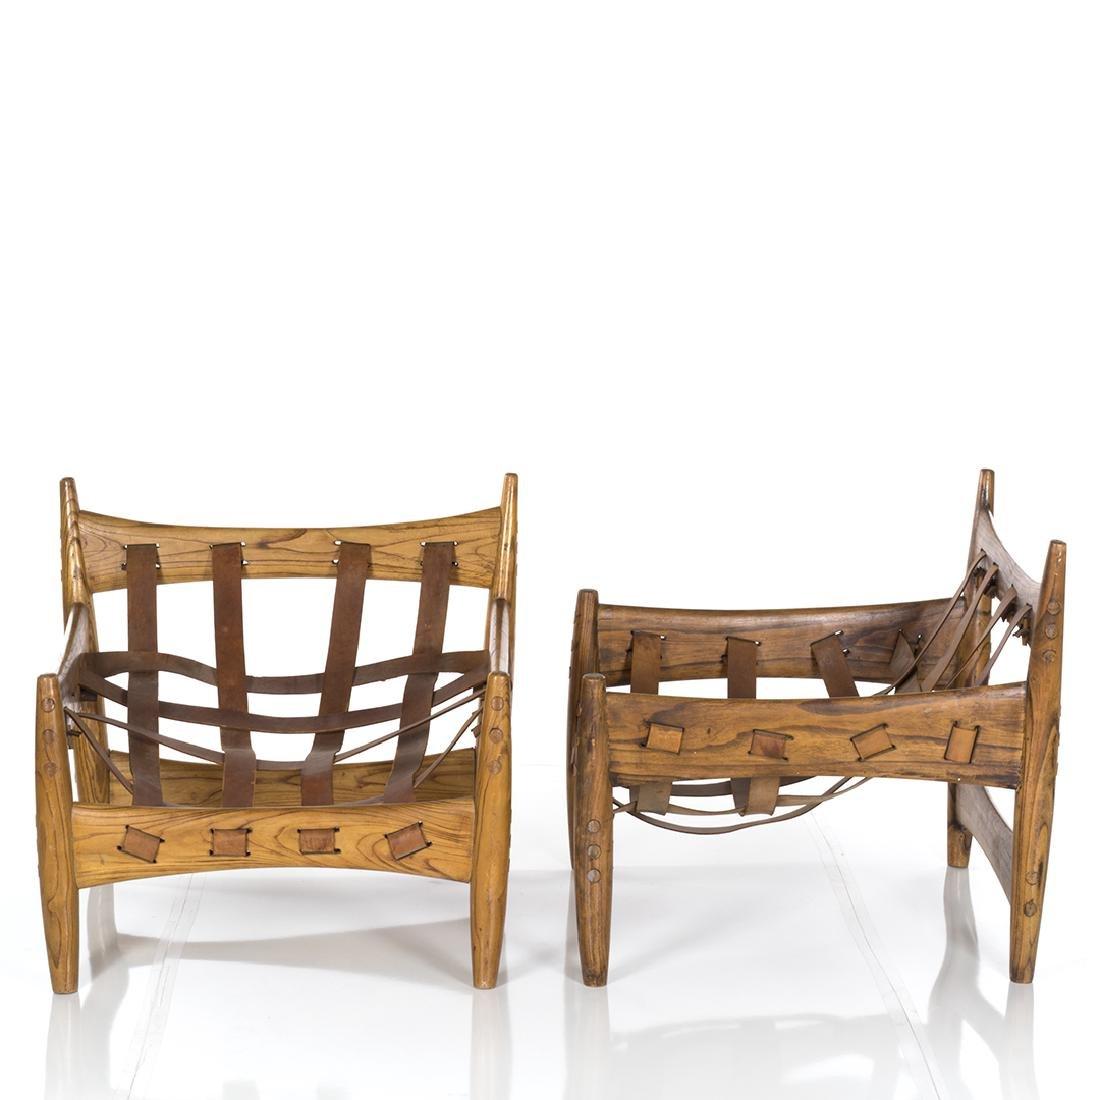 Sergio Rodrigues Sheriff Chairs (2) - 2